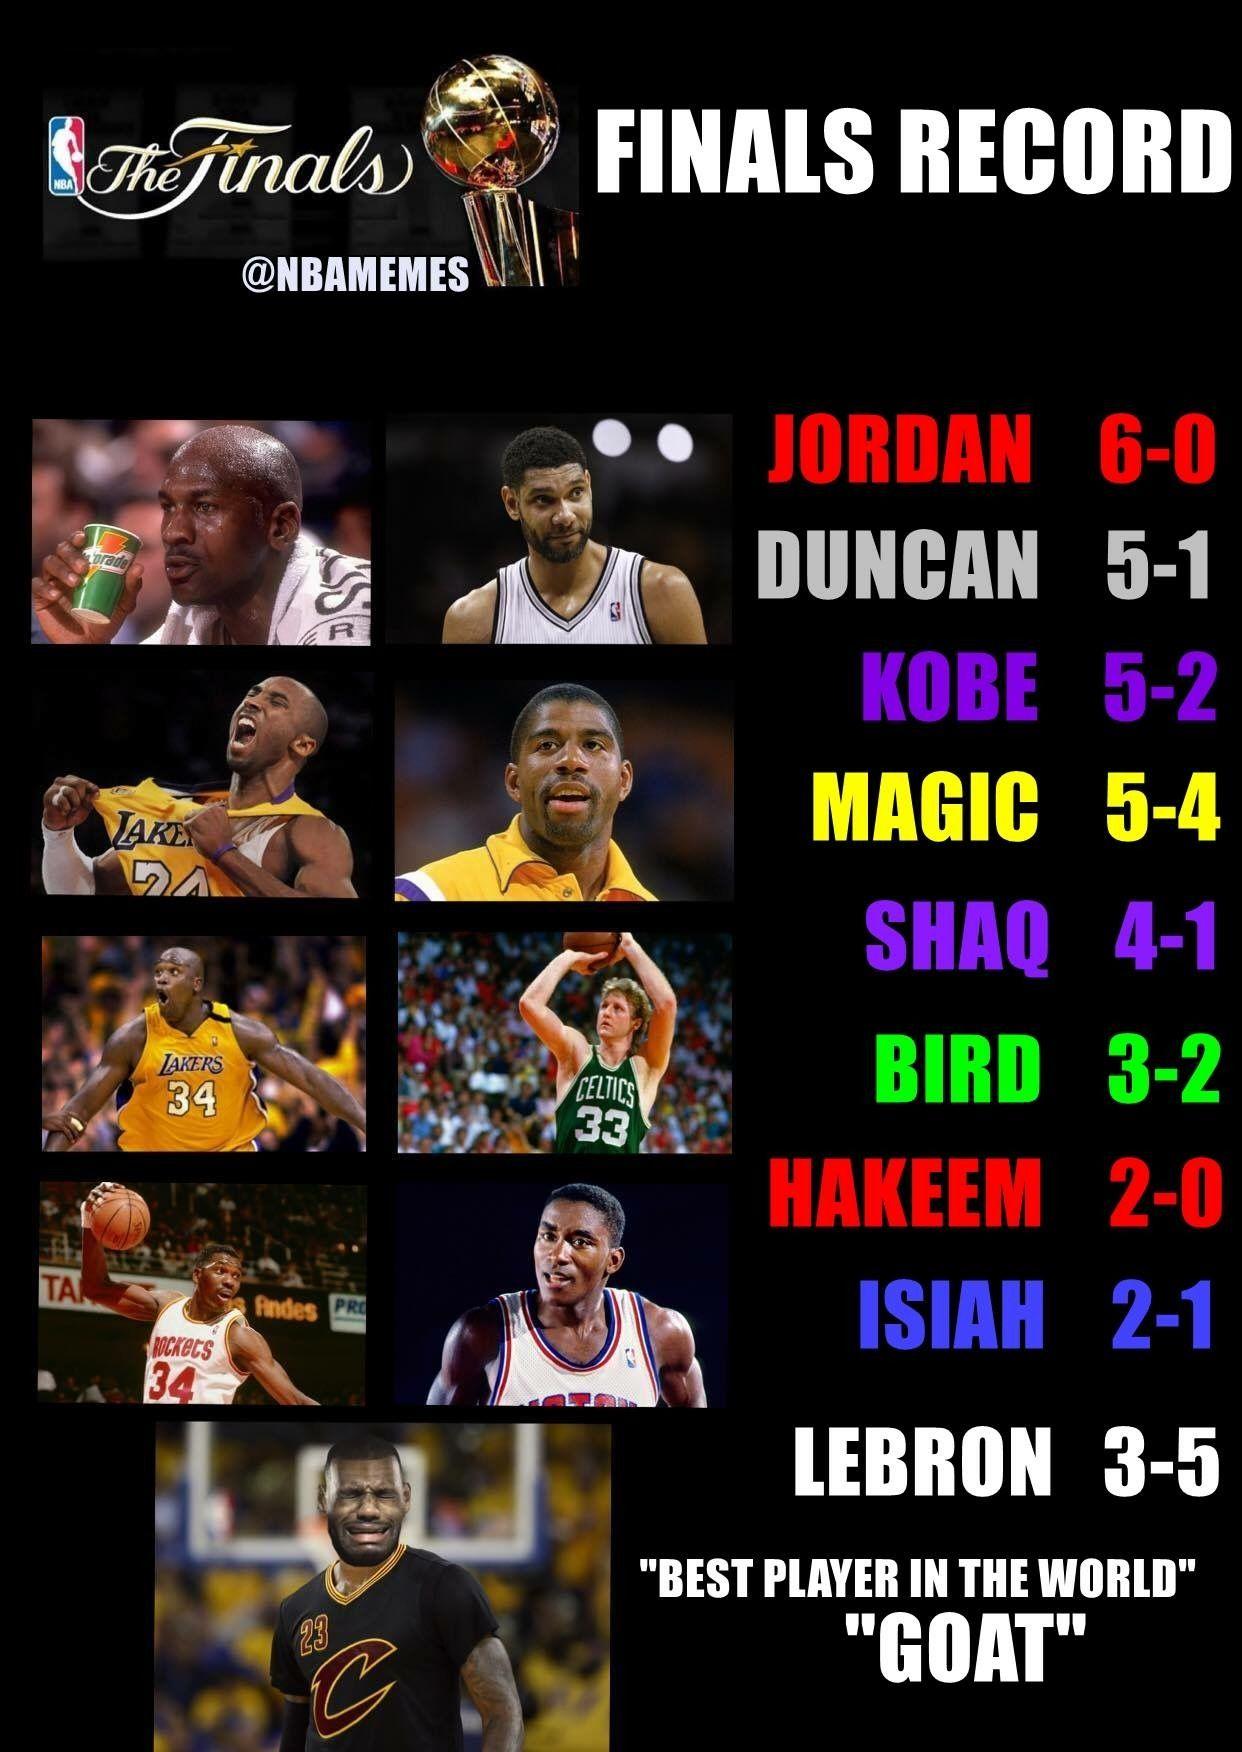 Pin By Geo Medina On Basketball Legends Funny Nba Memes Nba Funny Basketball Players Nba